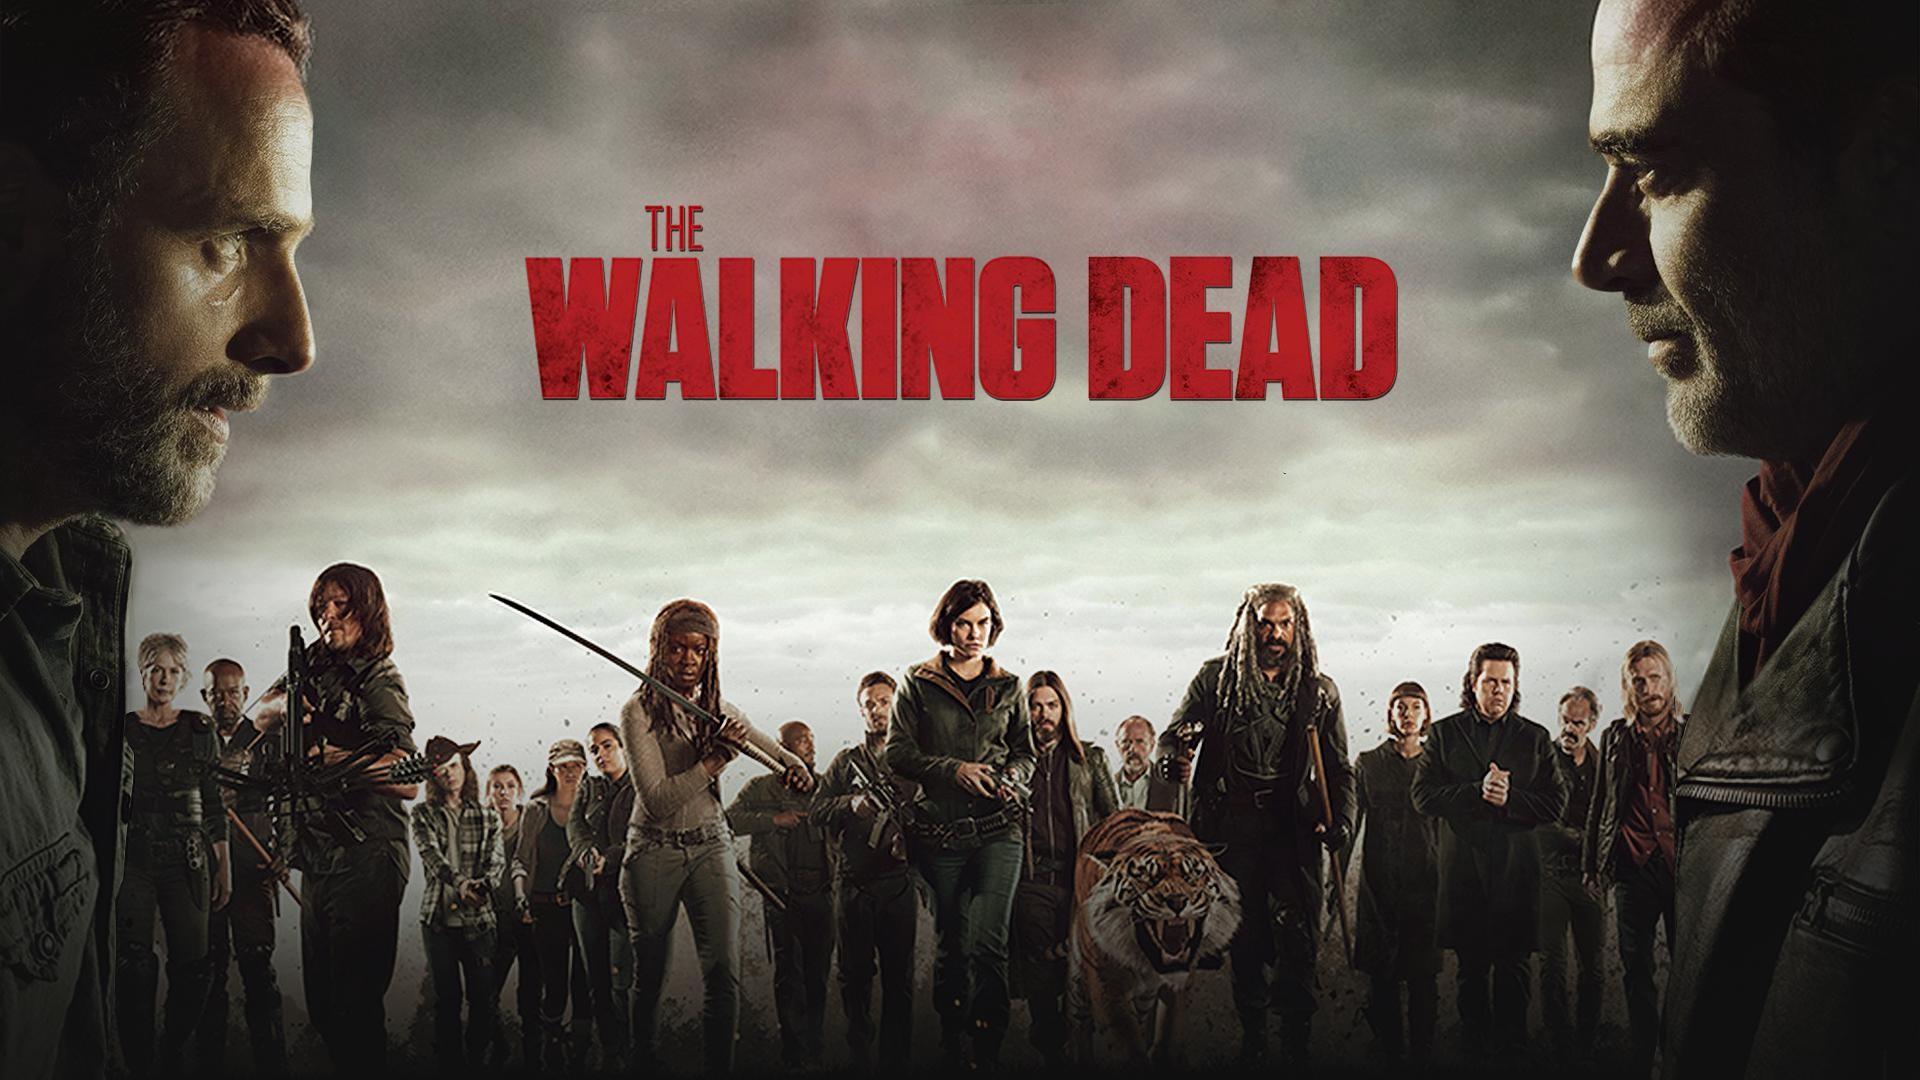 Walking Dead Background Wallpaper 68 Images